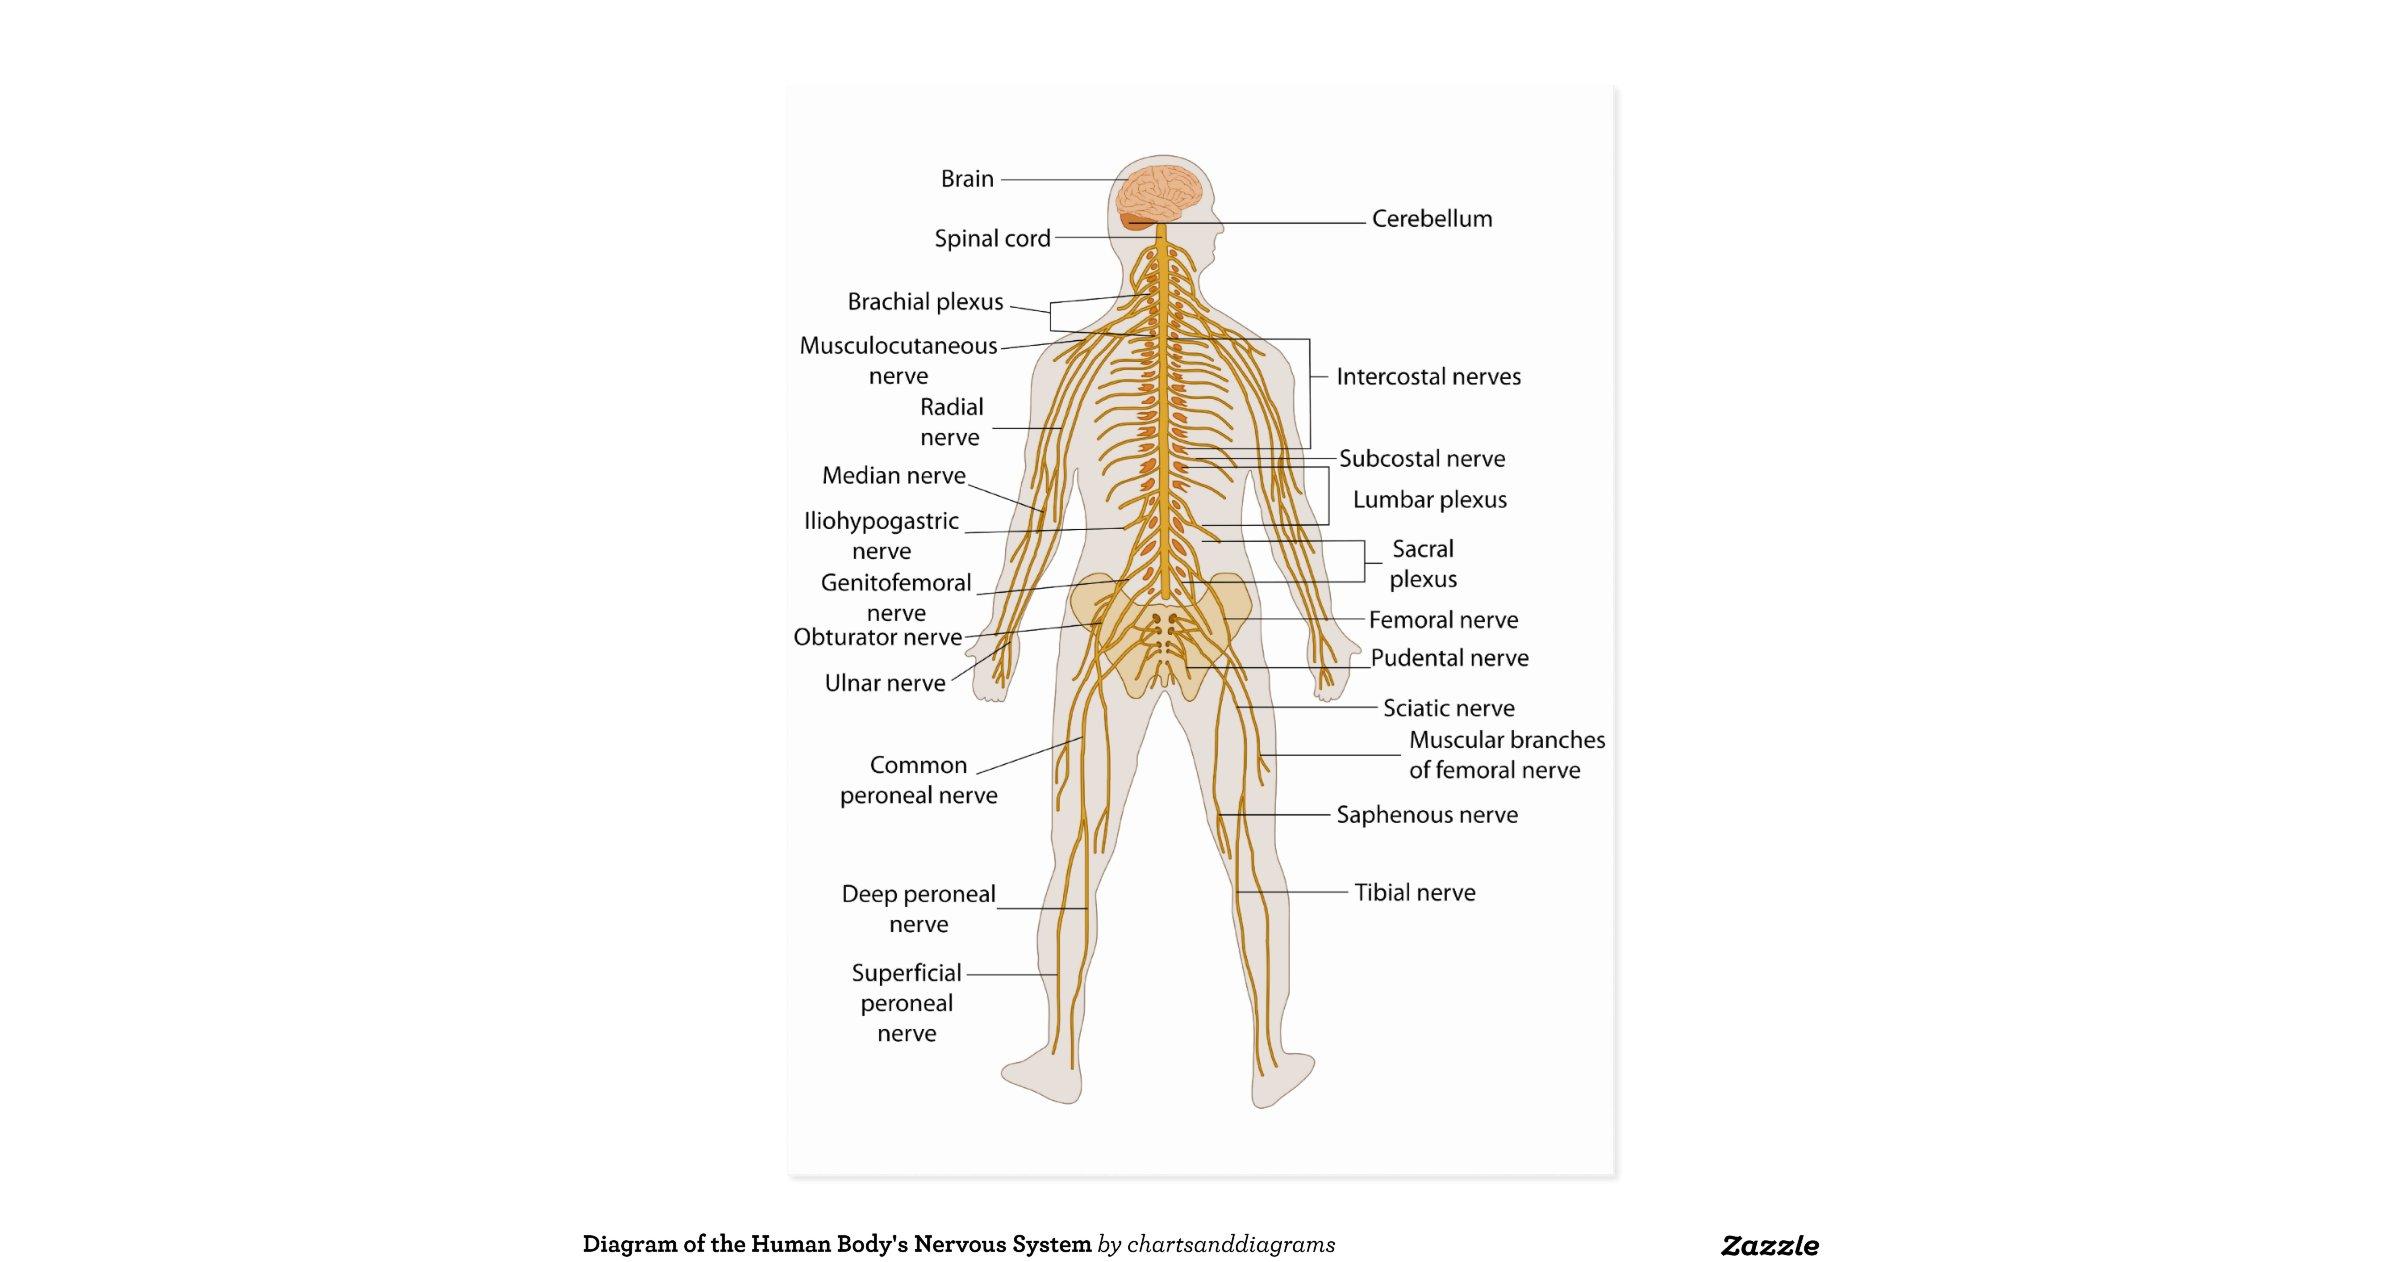 diagram of the human bodys nervous system postcard r03373c33f107477080950e09c78872f2 vgbaq 8byvr. Black Bedroom Furniture Sets. Home Design Ideas